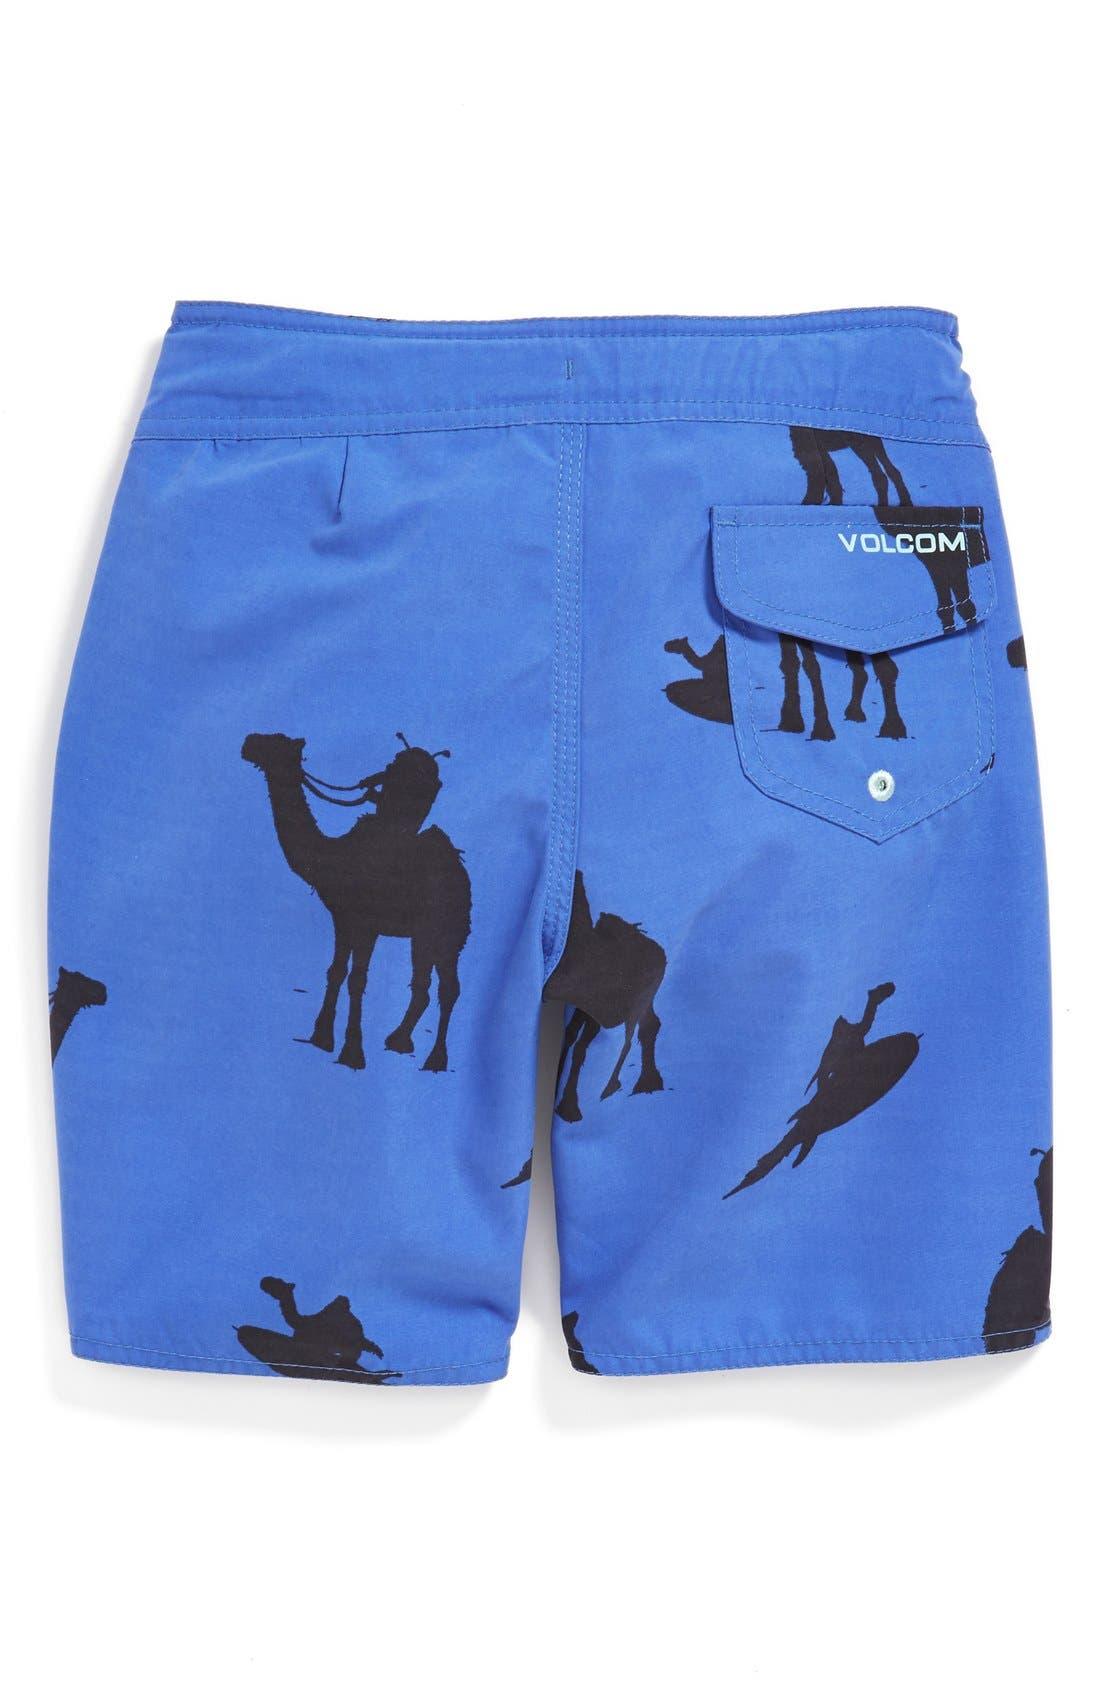 Alternate Image 2  - Volcom 'Silo' Board Shorts (Toddler Boys, Little Boys & Big Boys)